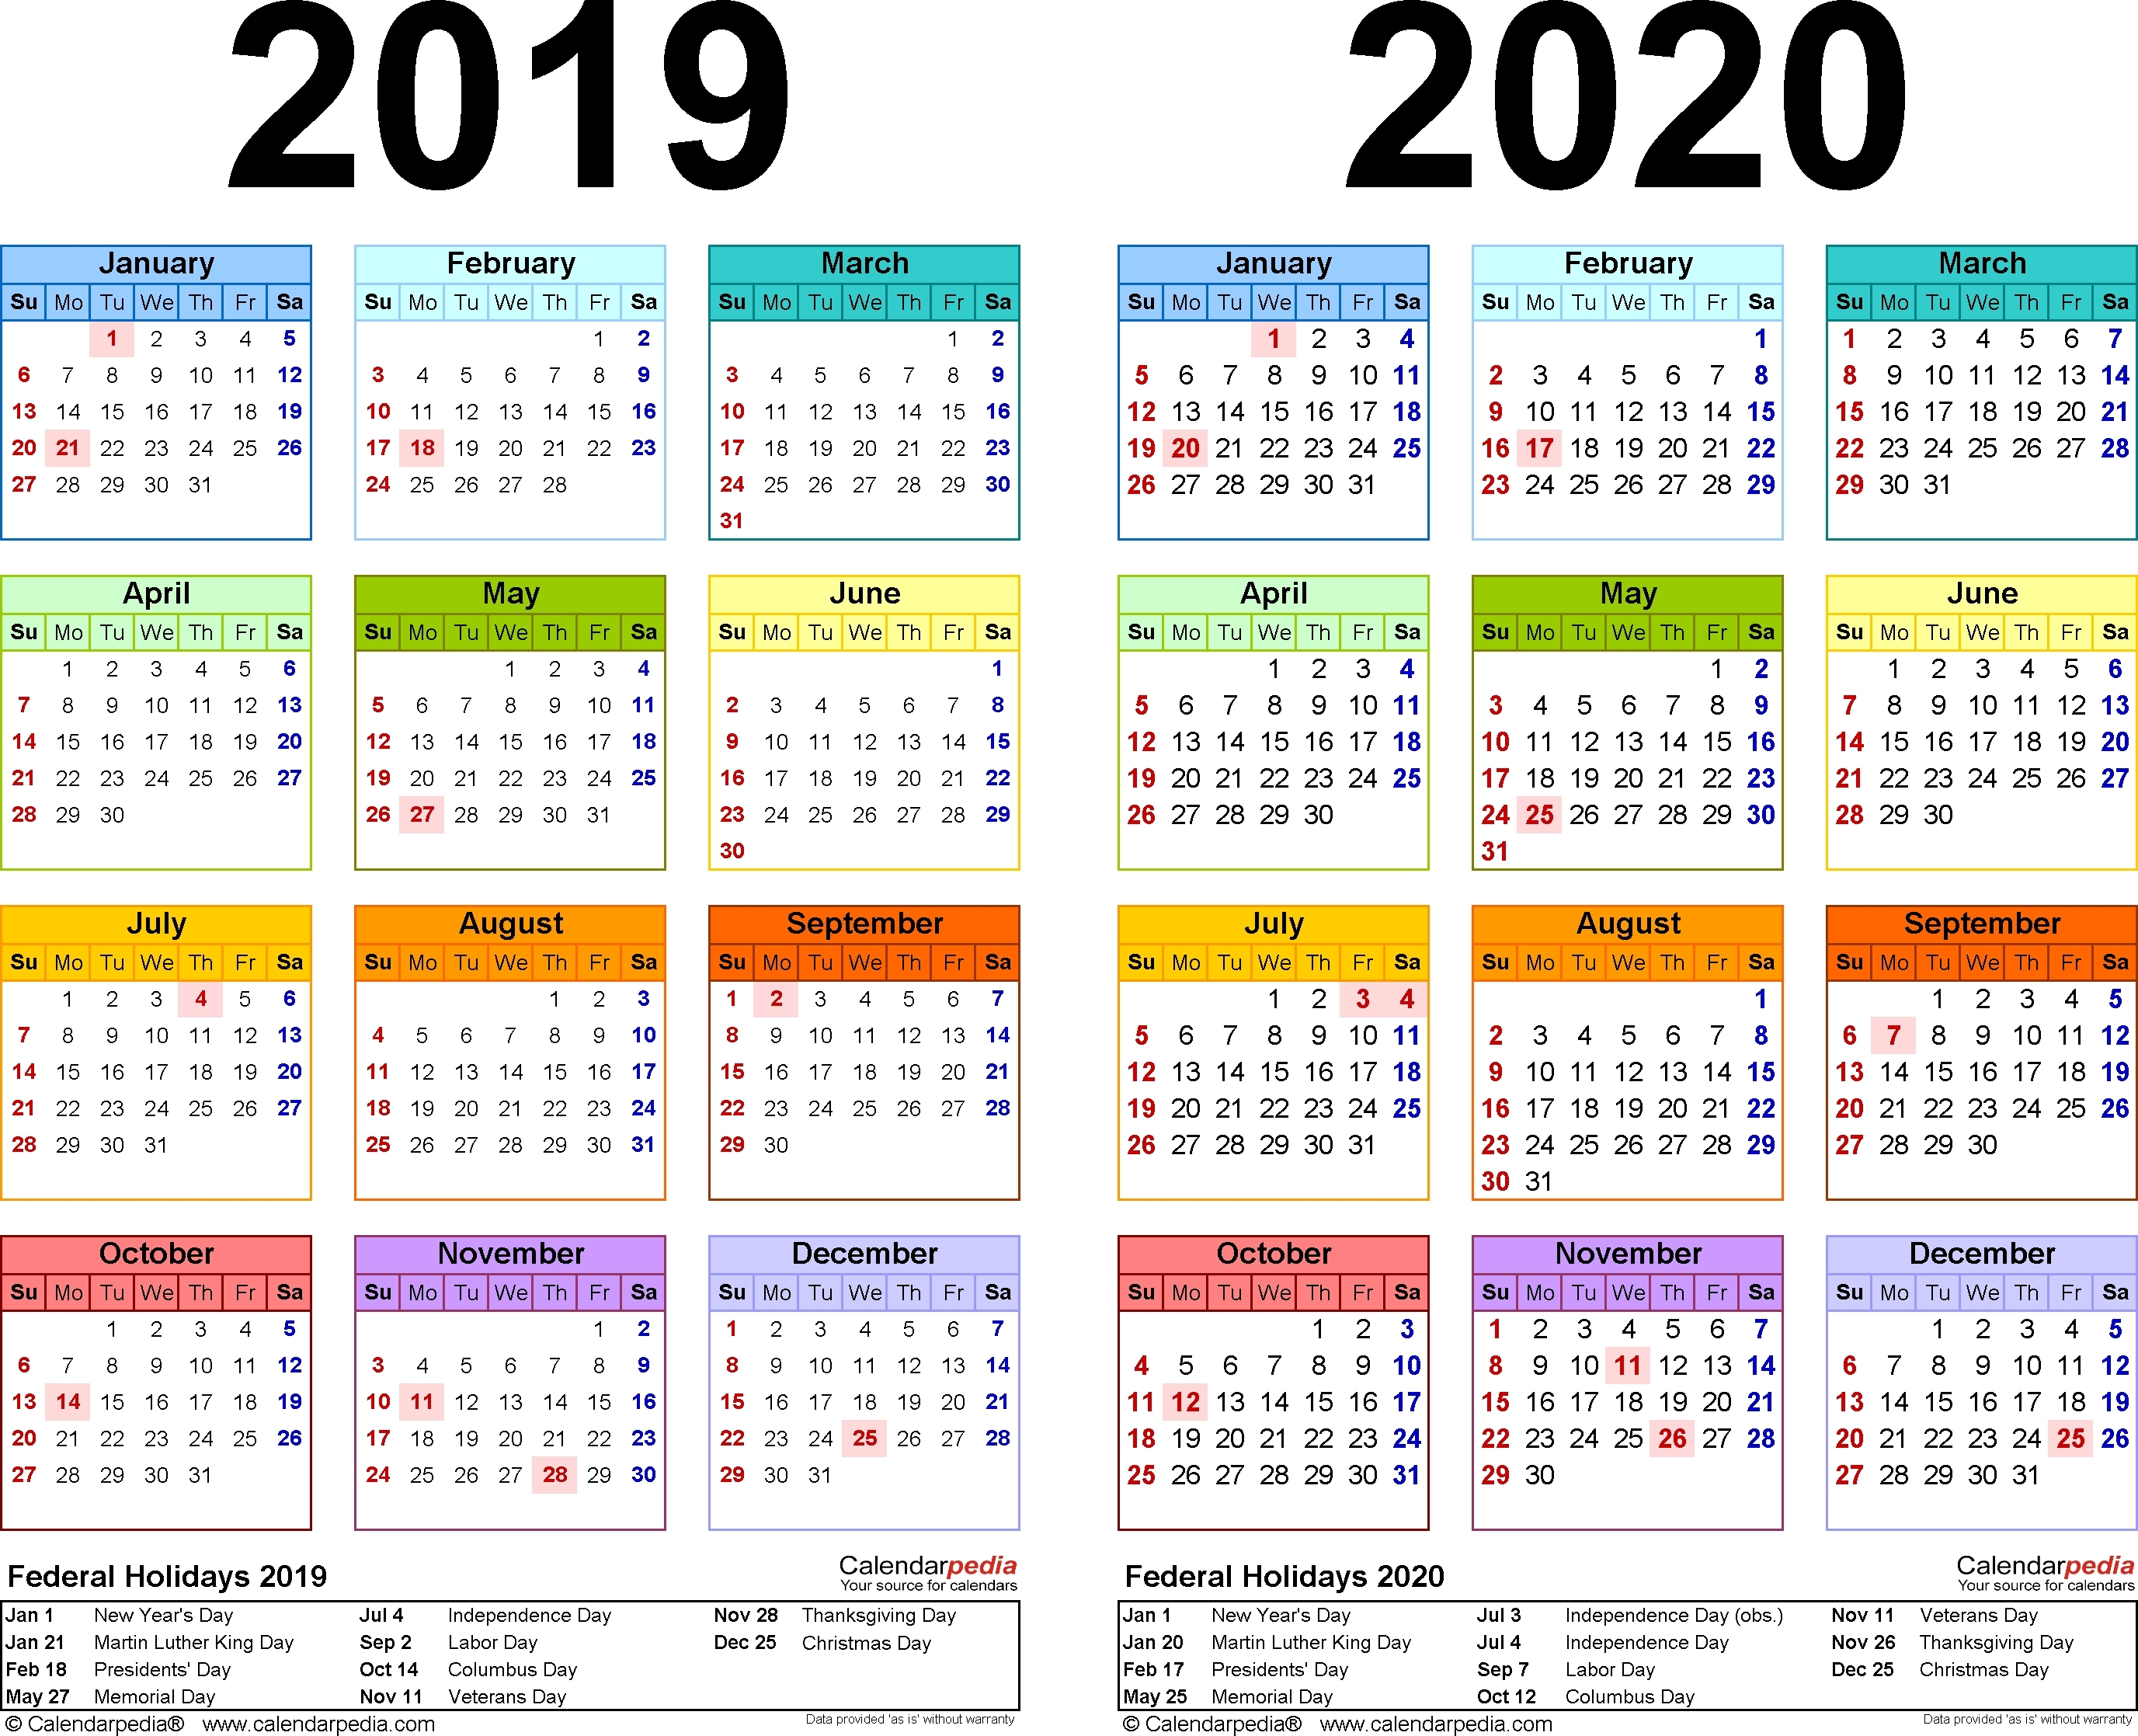 School Calendar And Holidays 2020 | Calendar Design Ideas-Nz School Holidays 2020 Calendar